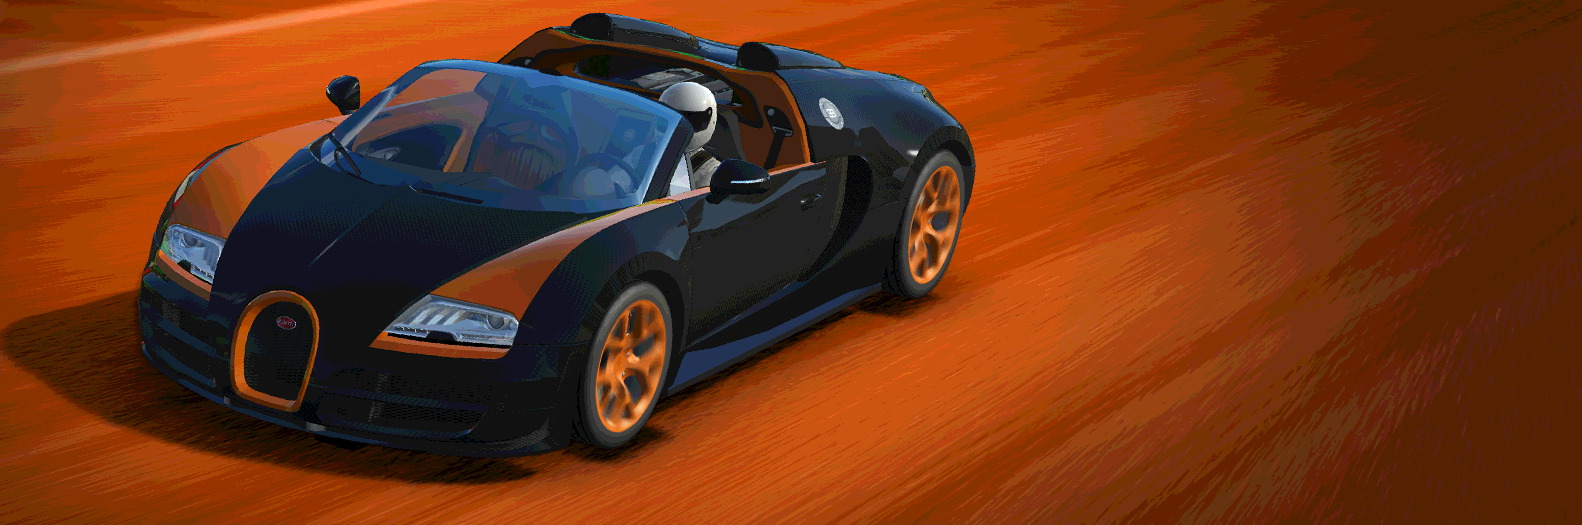 Bugatti Veyron 16.4 Grand Sport Vitesse (Exclusive Series ...